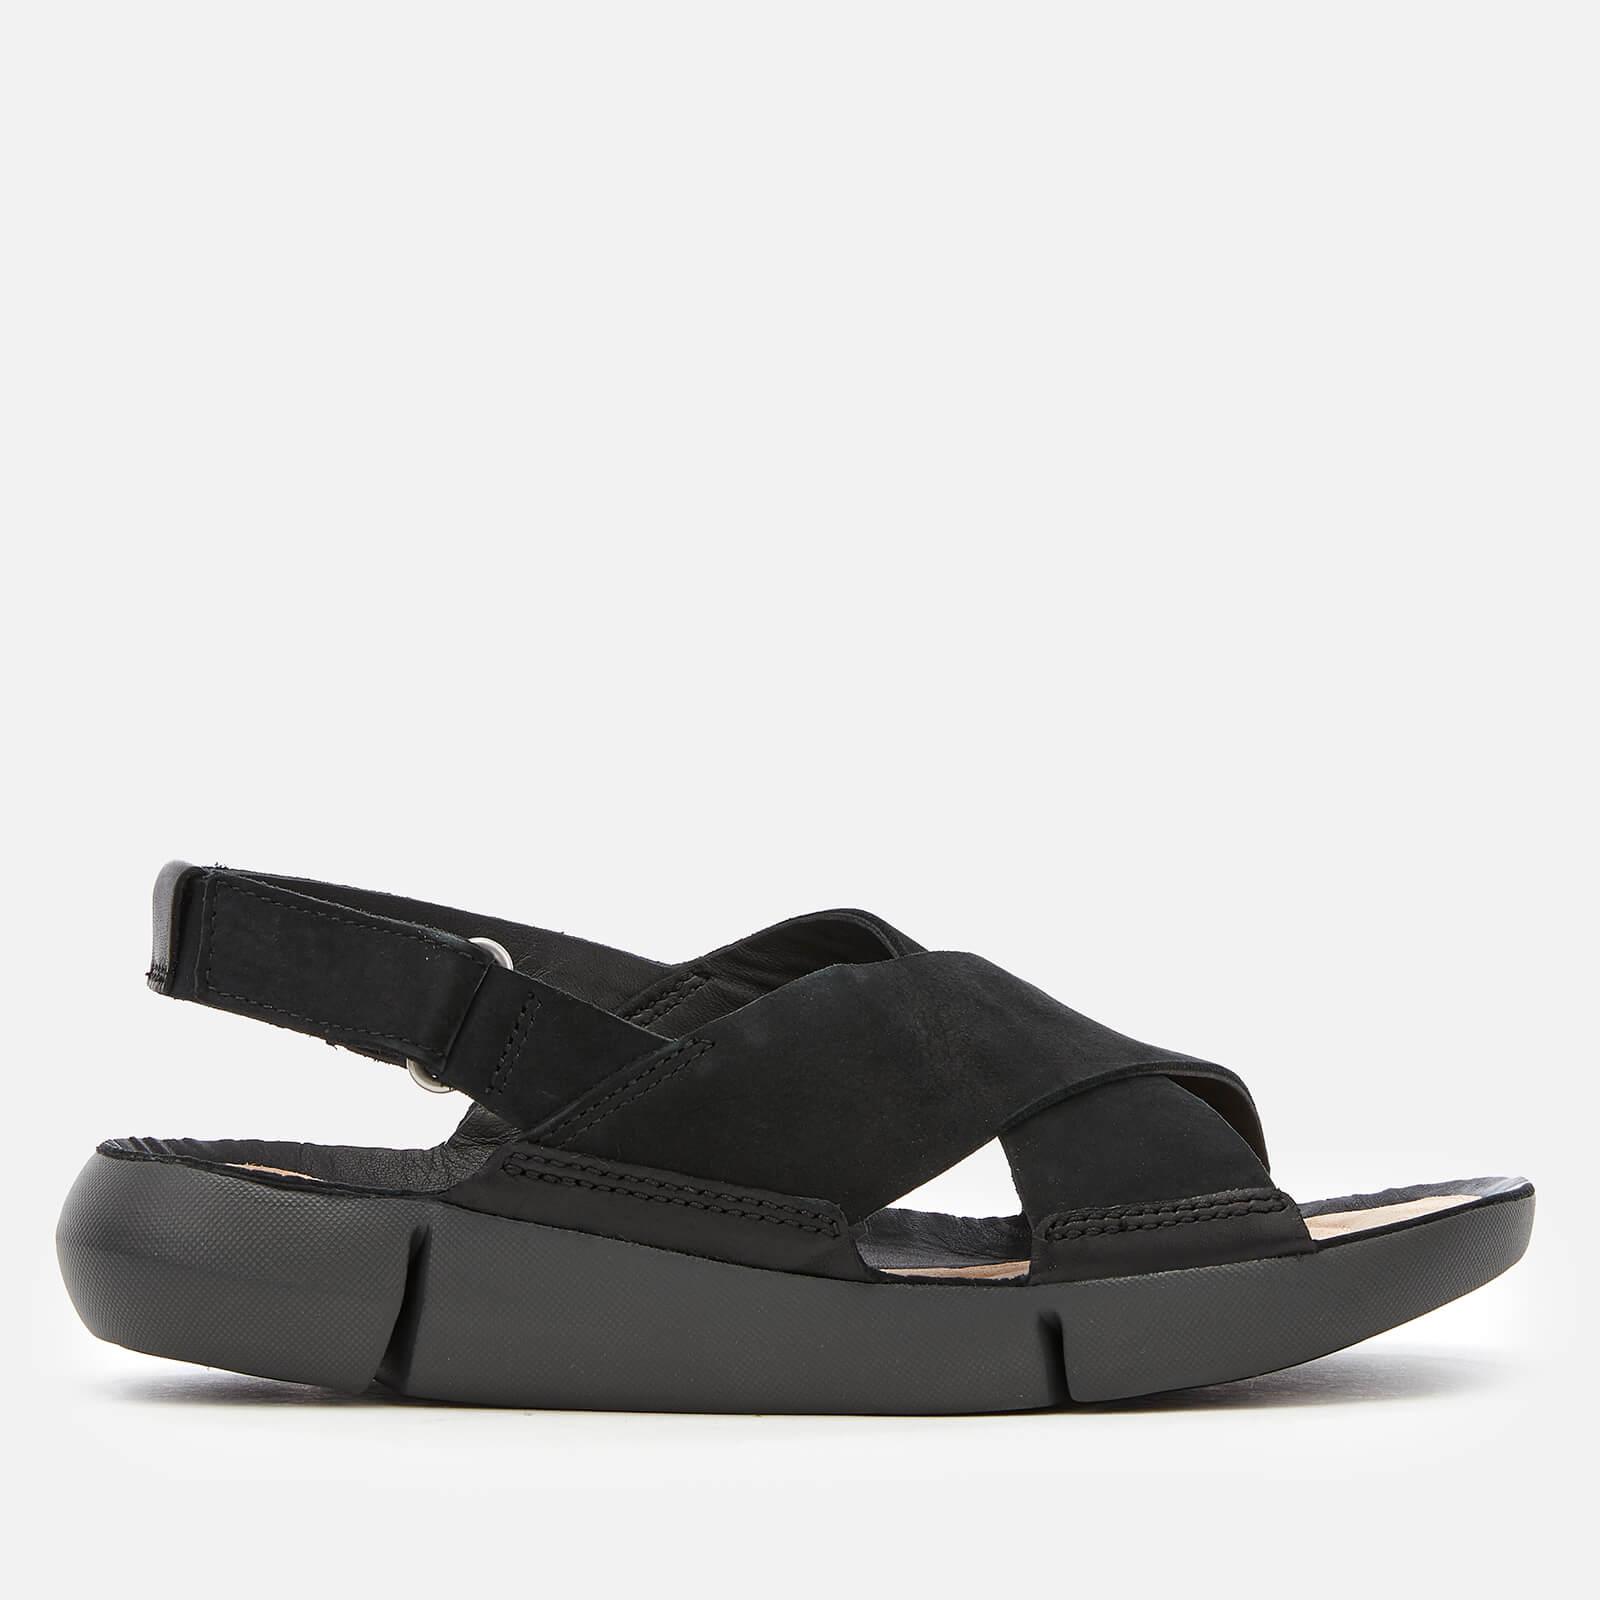 Clarks Women's Tri Chloe Cross Strap Sandals - Black Combi - UK 8 - Black